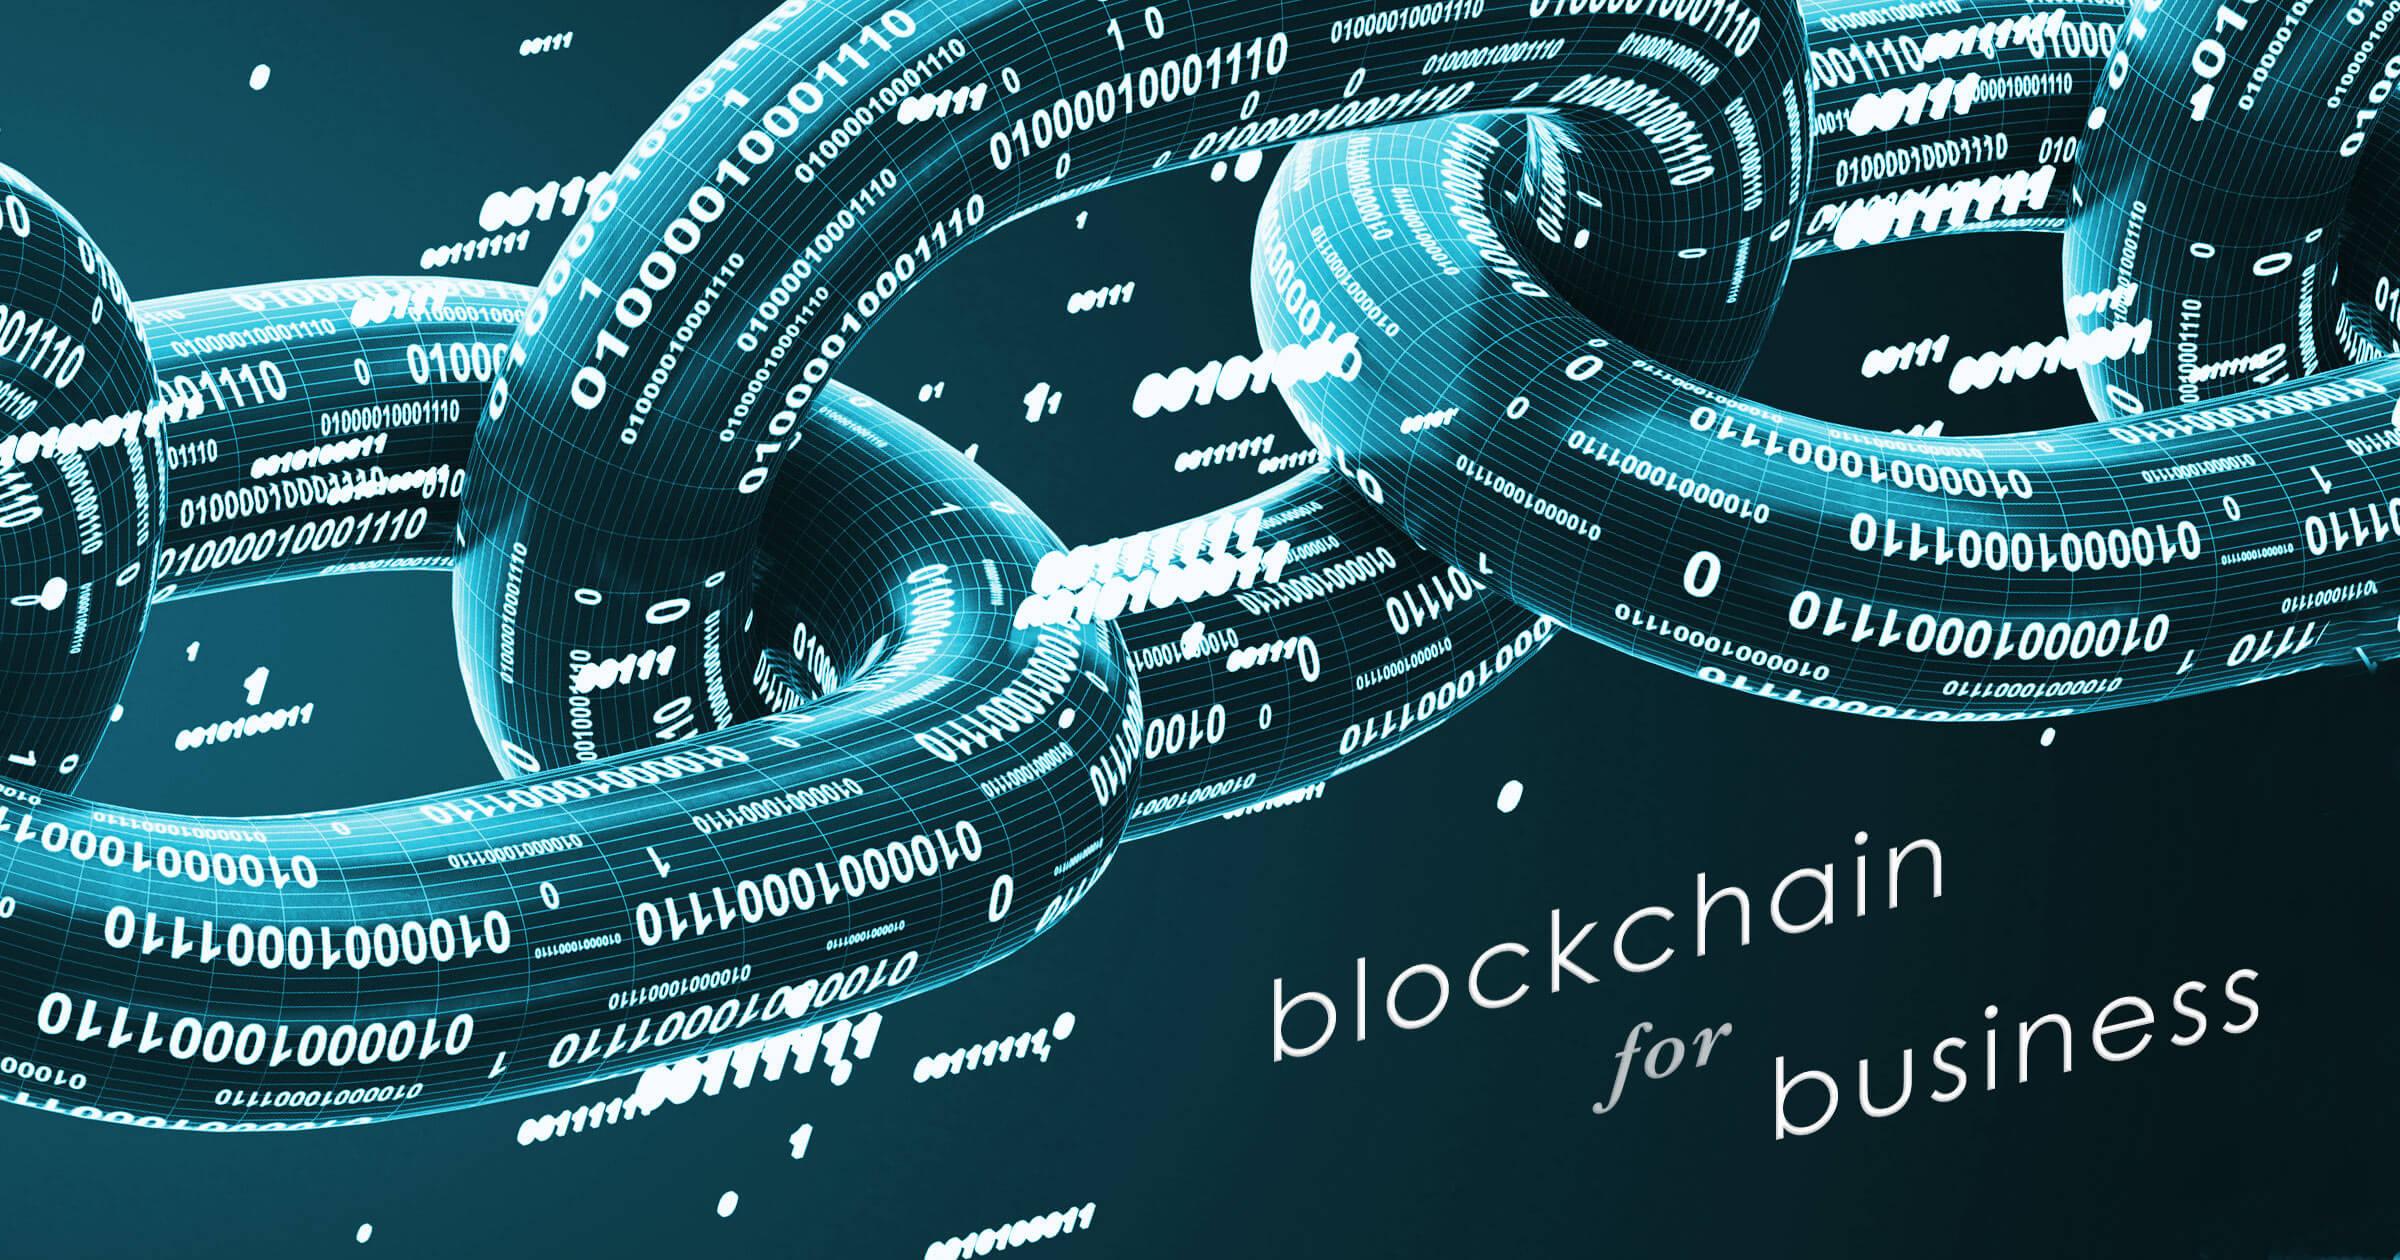 Blockchain for Business: Far Beyond Bitcoin